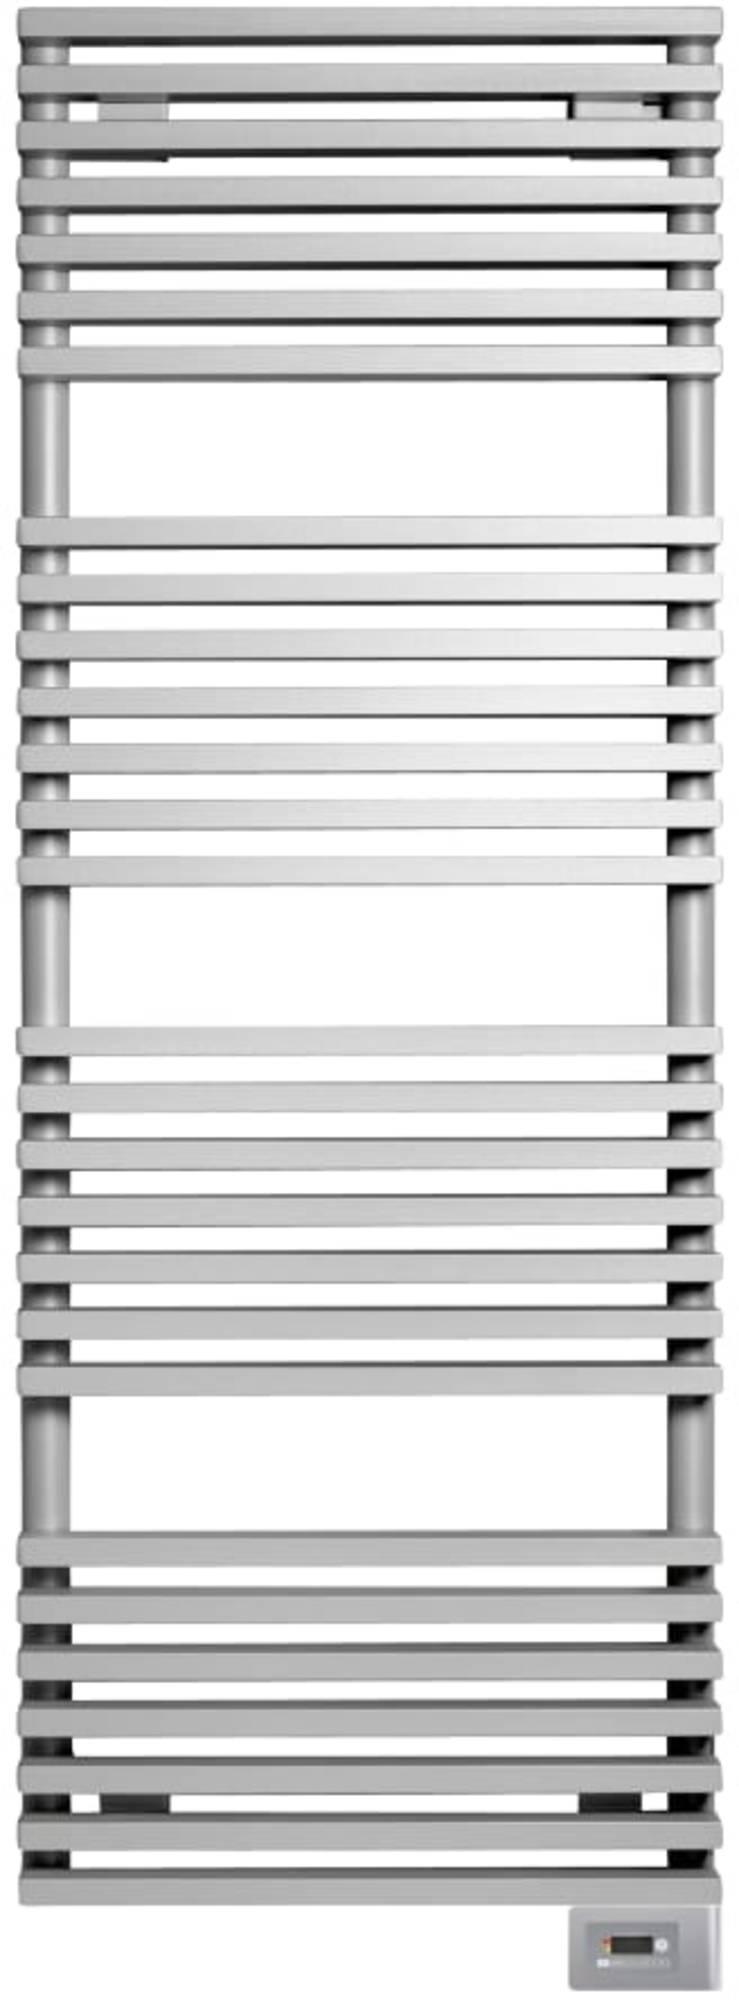 Vasco Zana Bad-EL elektrische designradiator 182x50cm 1250W Verkeerswit